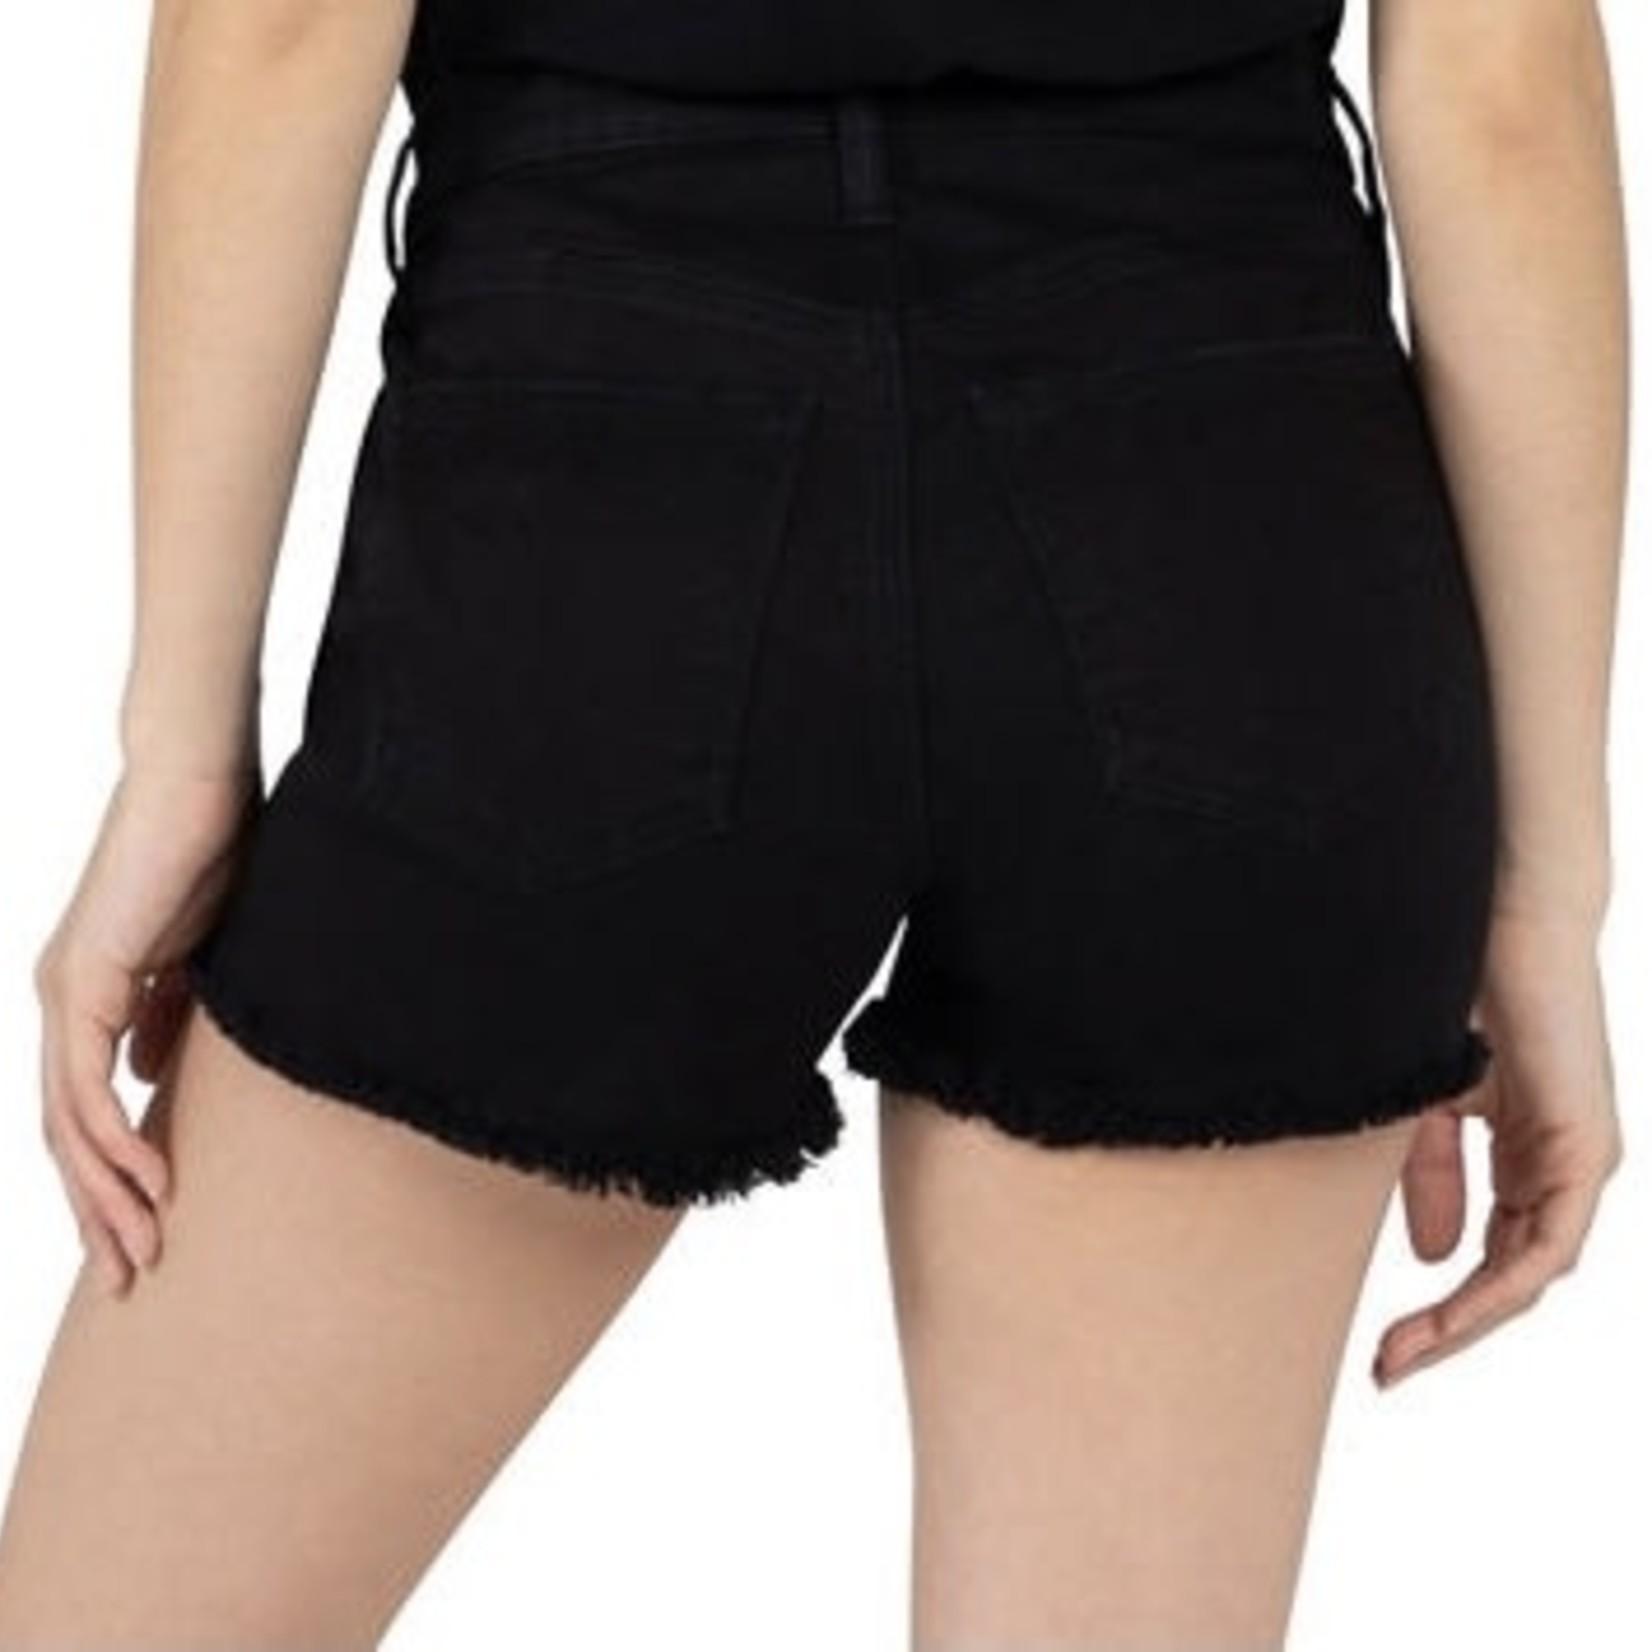 Silver Jeans Co. Not Your Boyfriend's Shorts